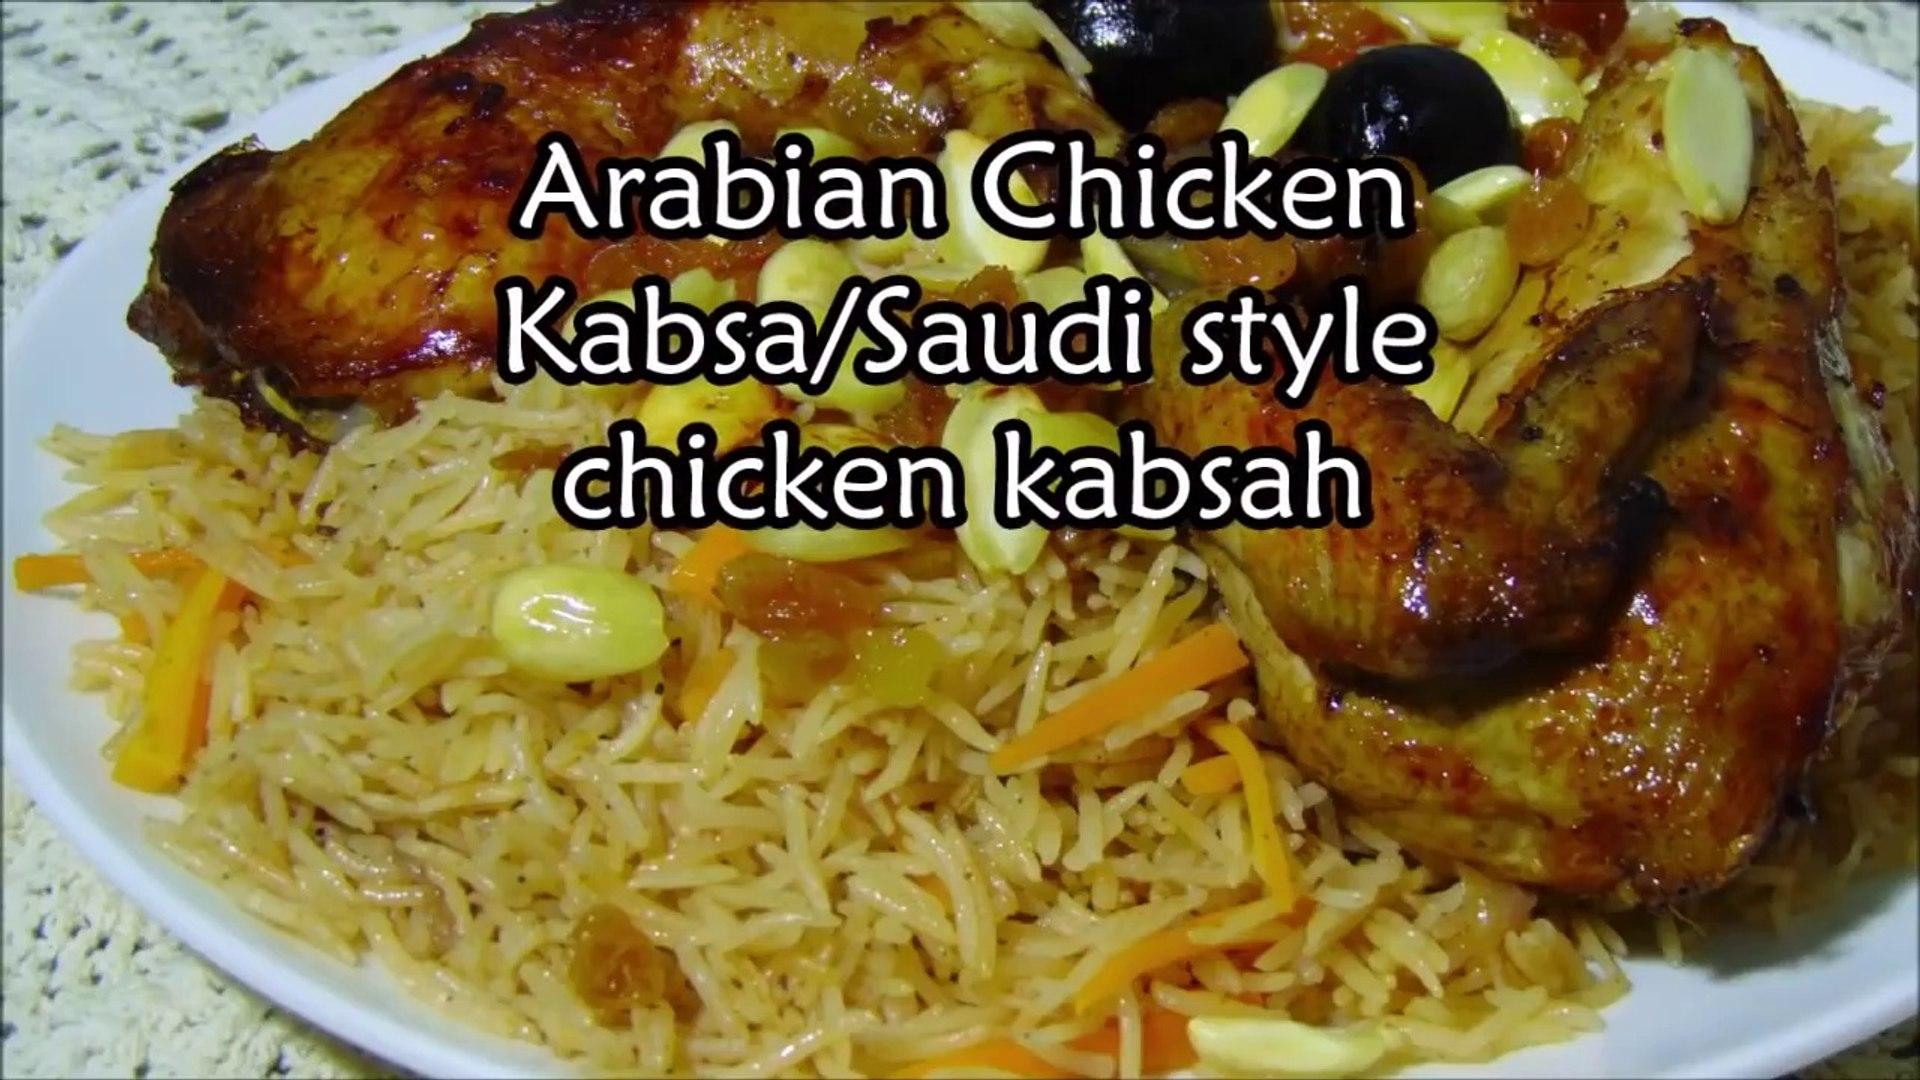 Arabian Chicken Kabsa Arabian Kabsa Chicken Kabsa Arabian Dish Video Dailymotion